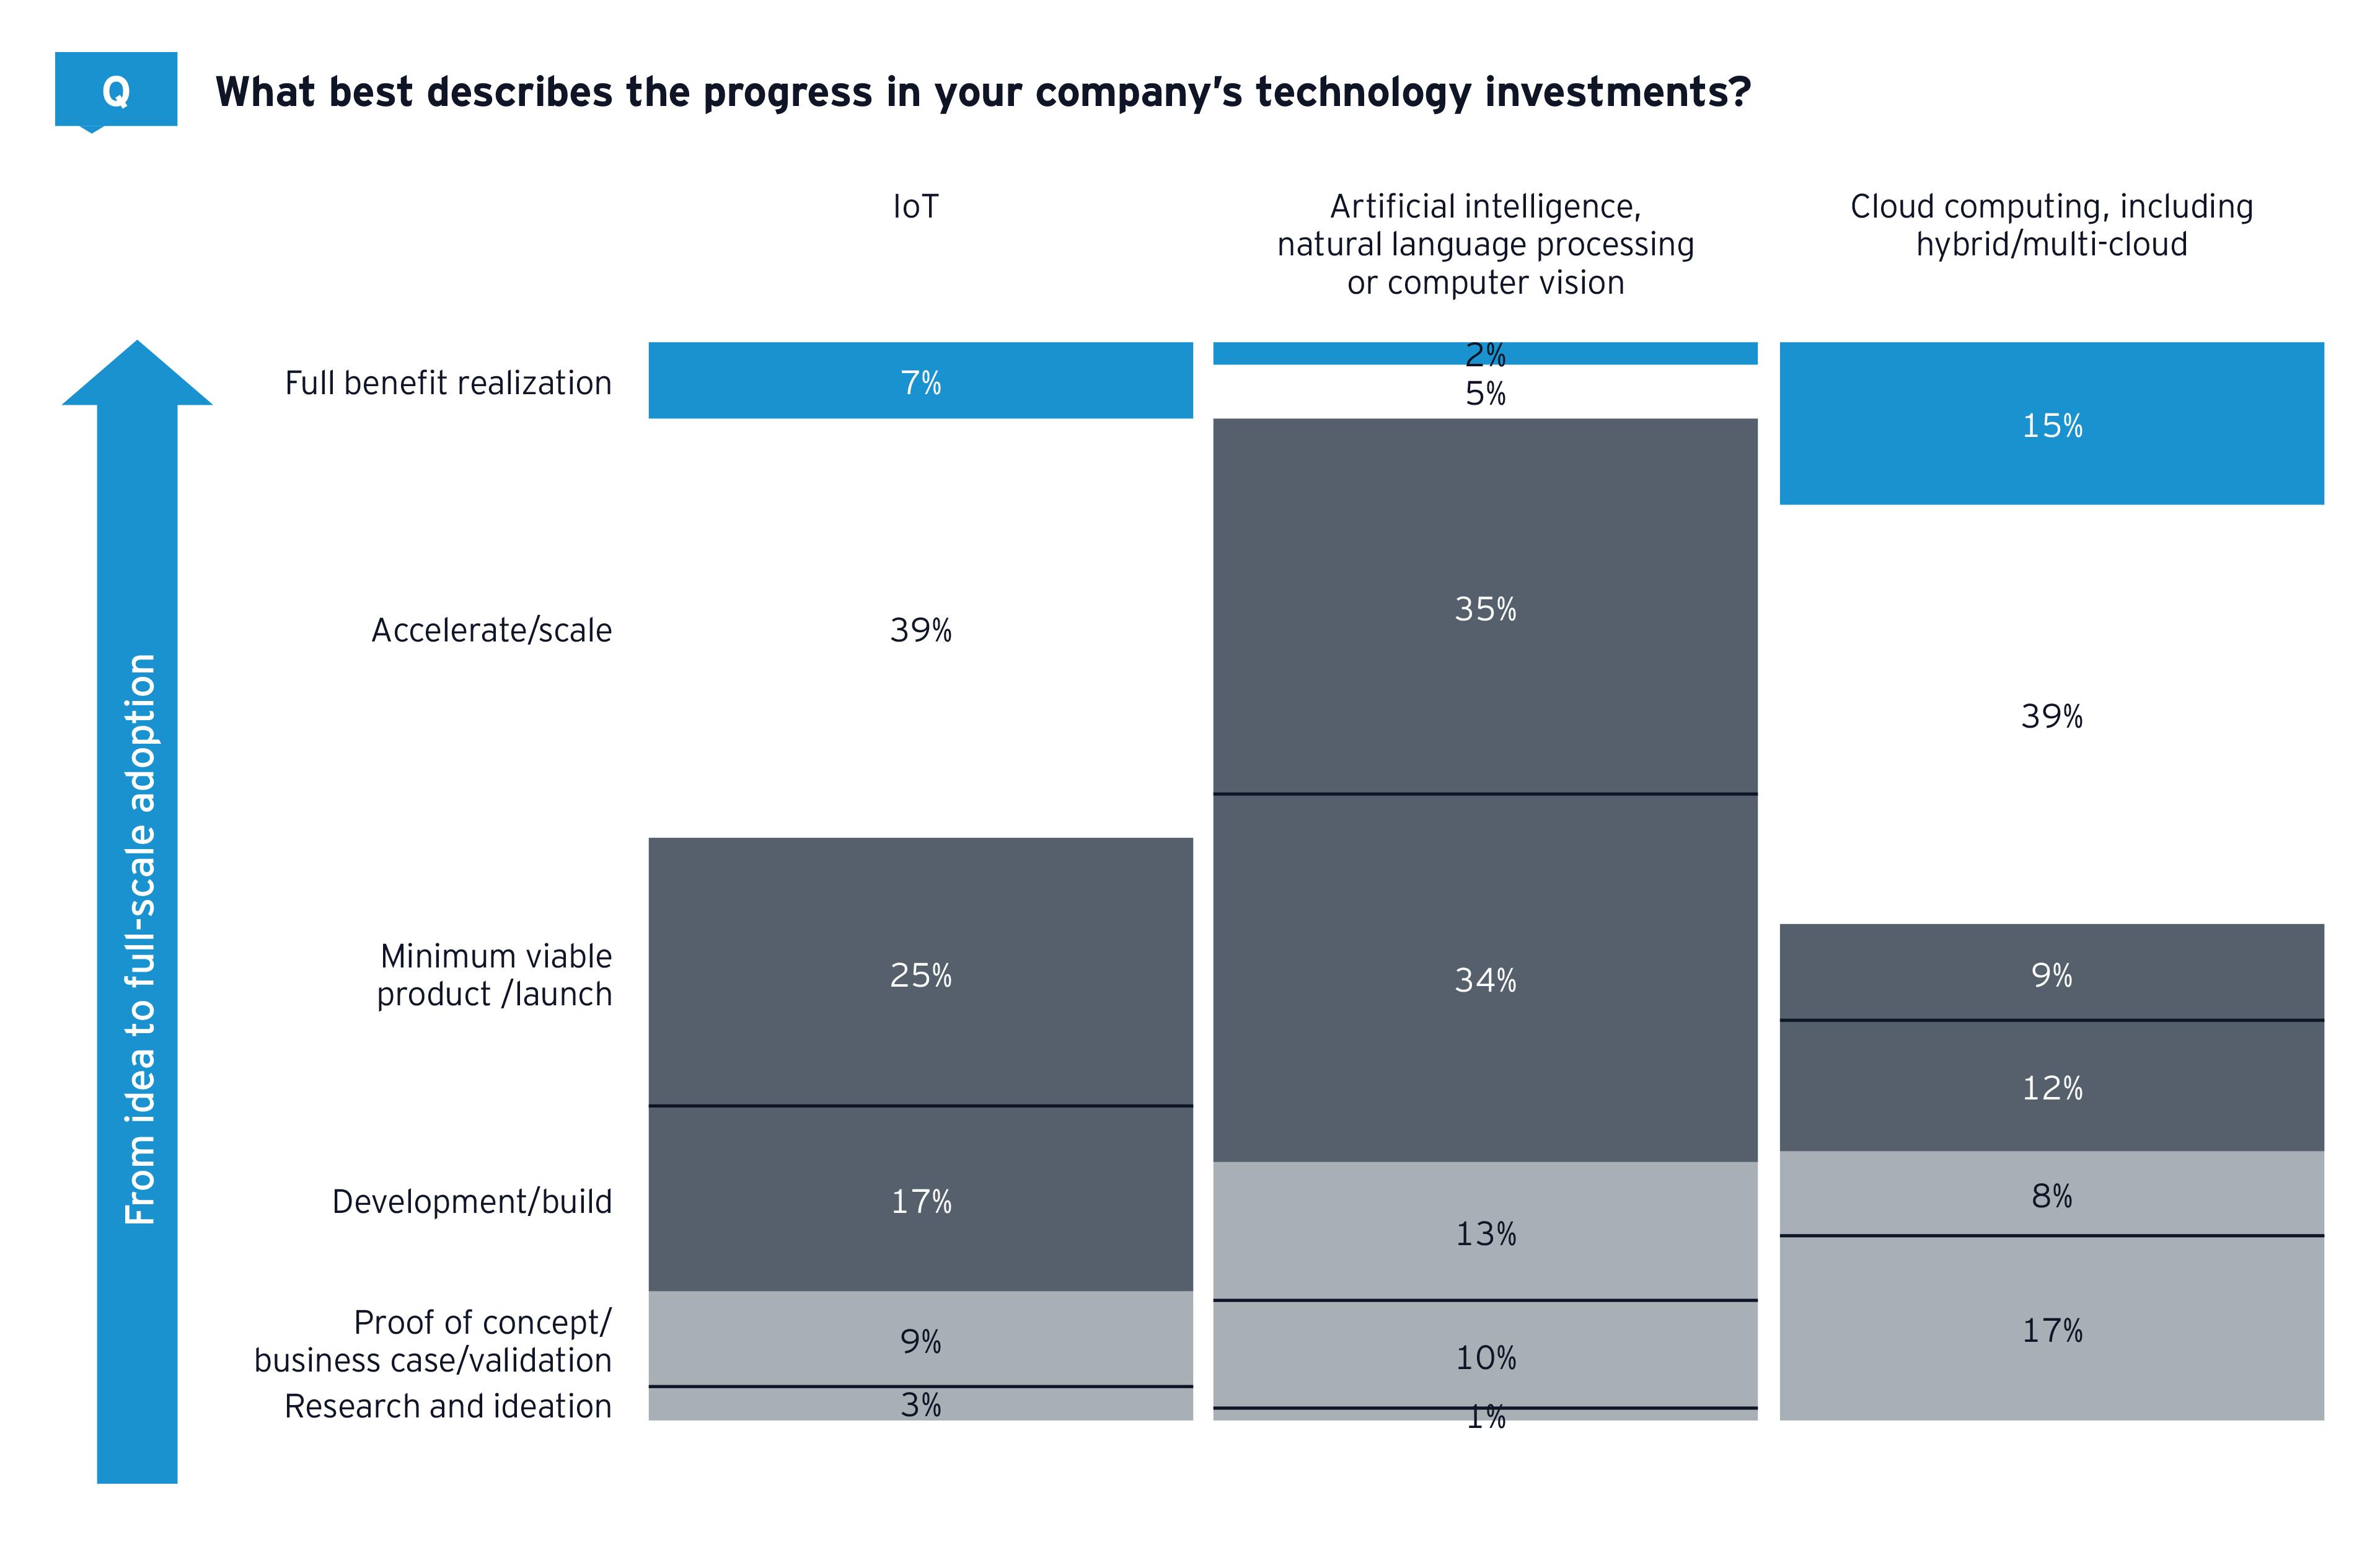 EY-Parthenon DII survey tech sector company progress tech investments